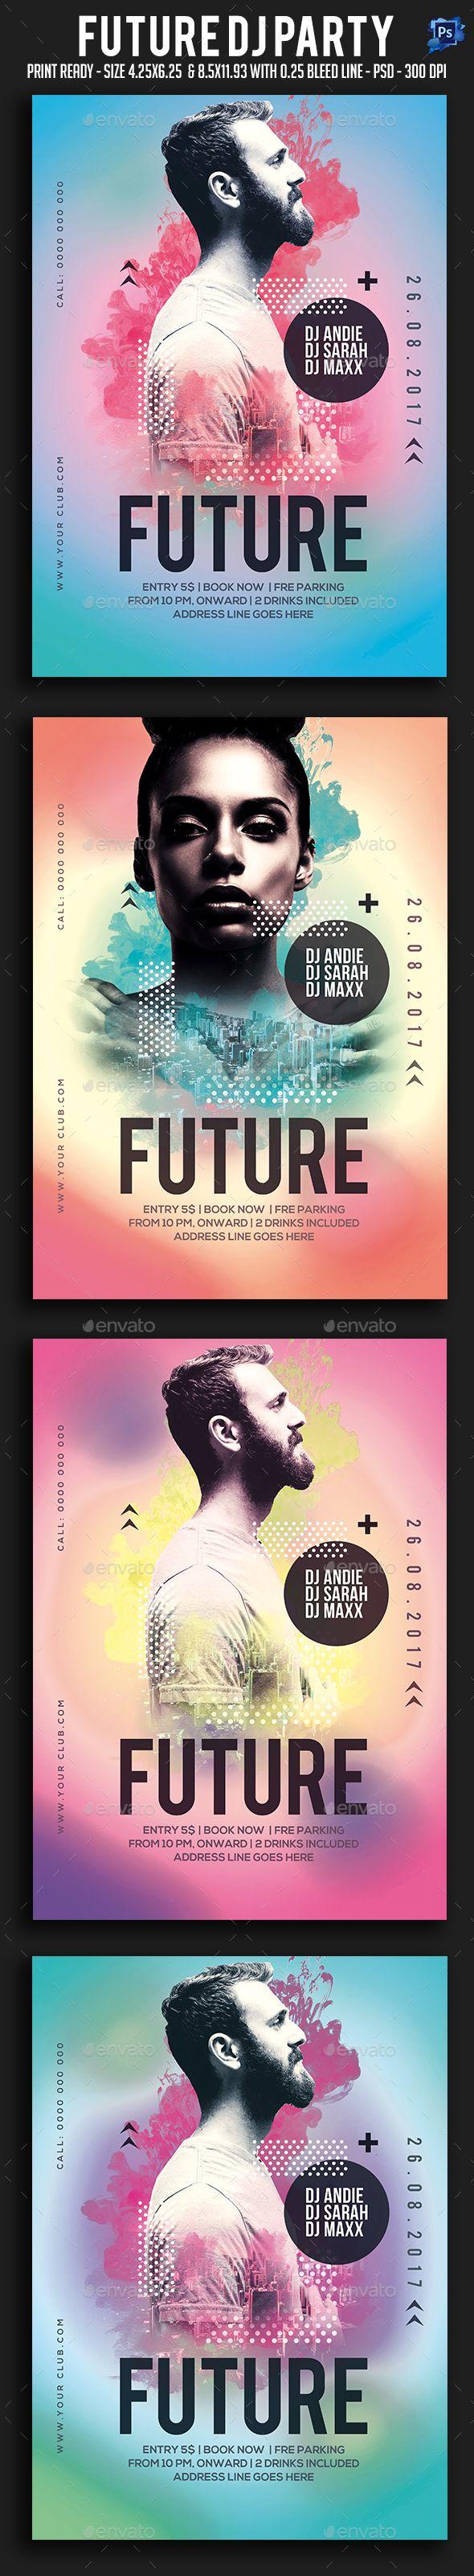 Future Dj Party Flyer